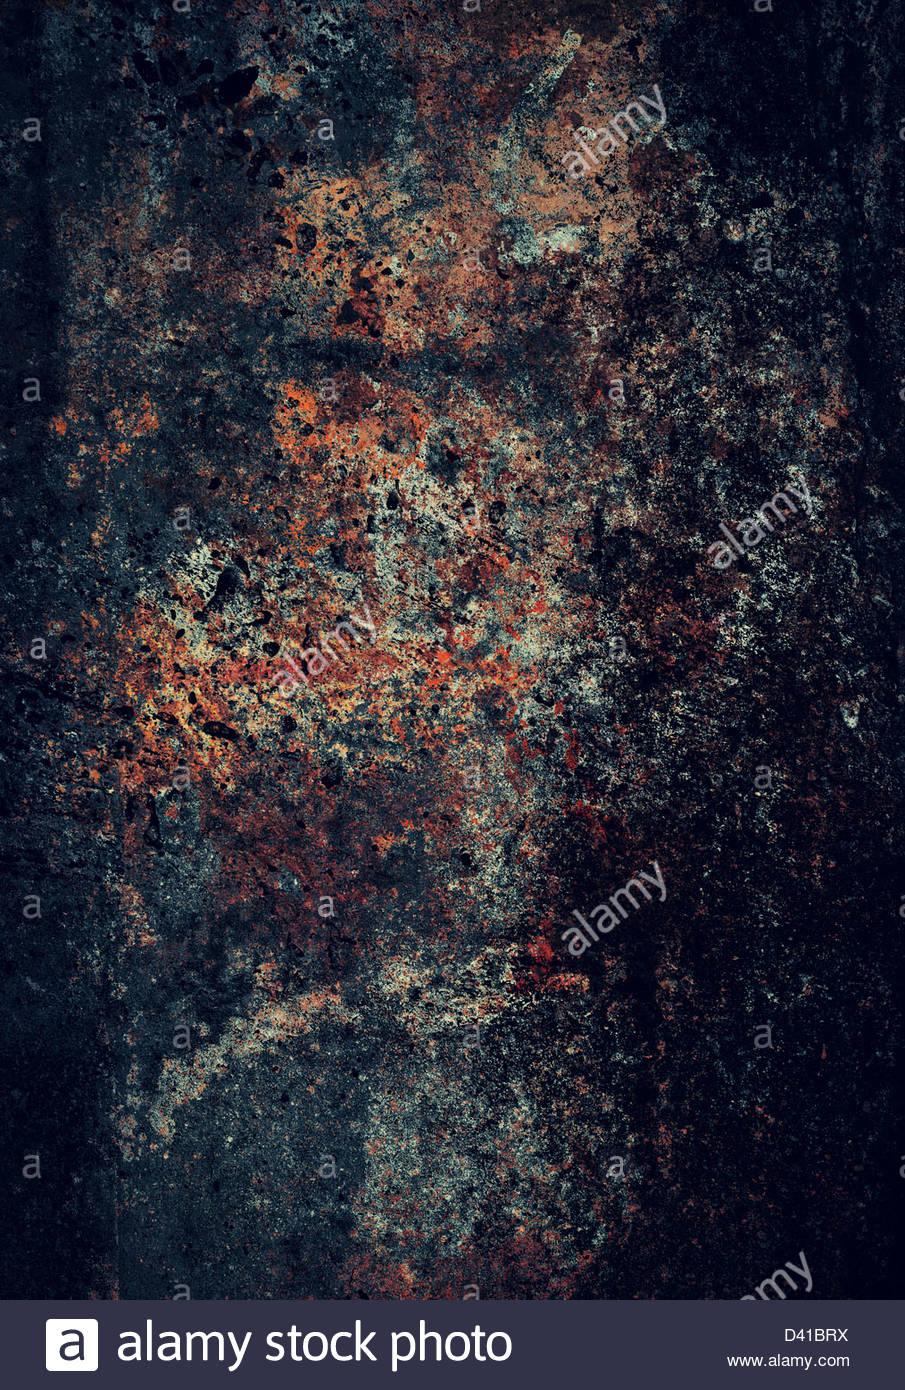 Textura del fondo grunge Imagen De Stock